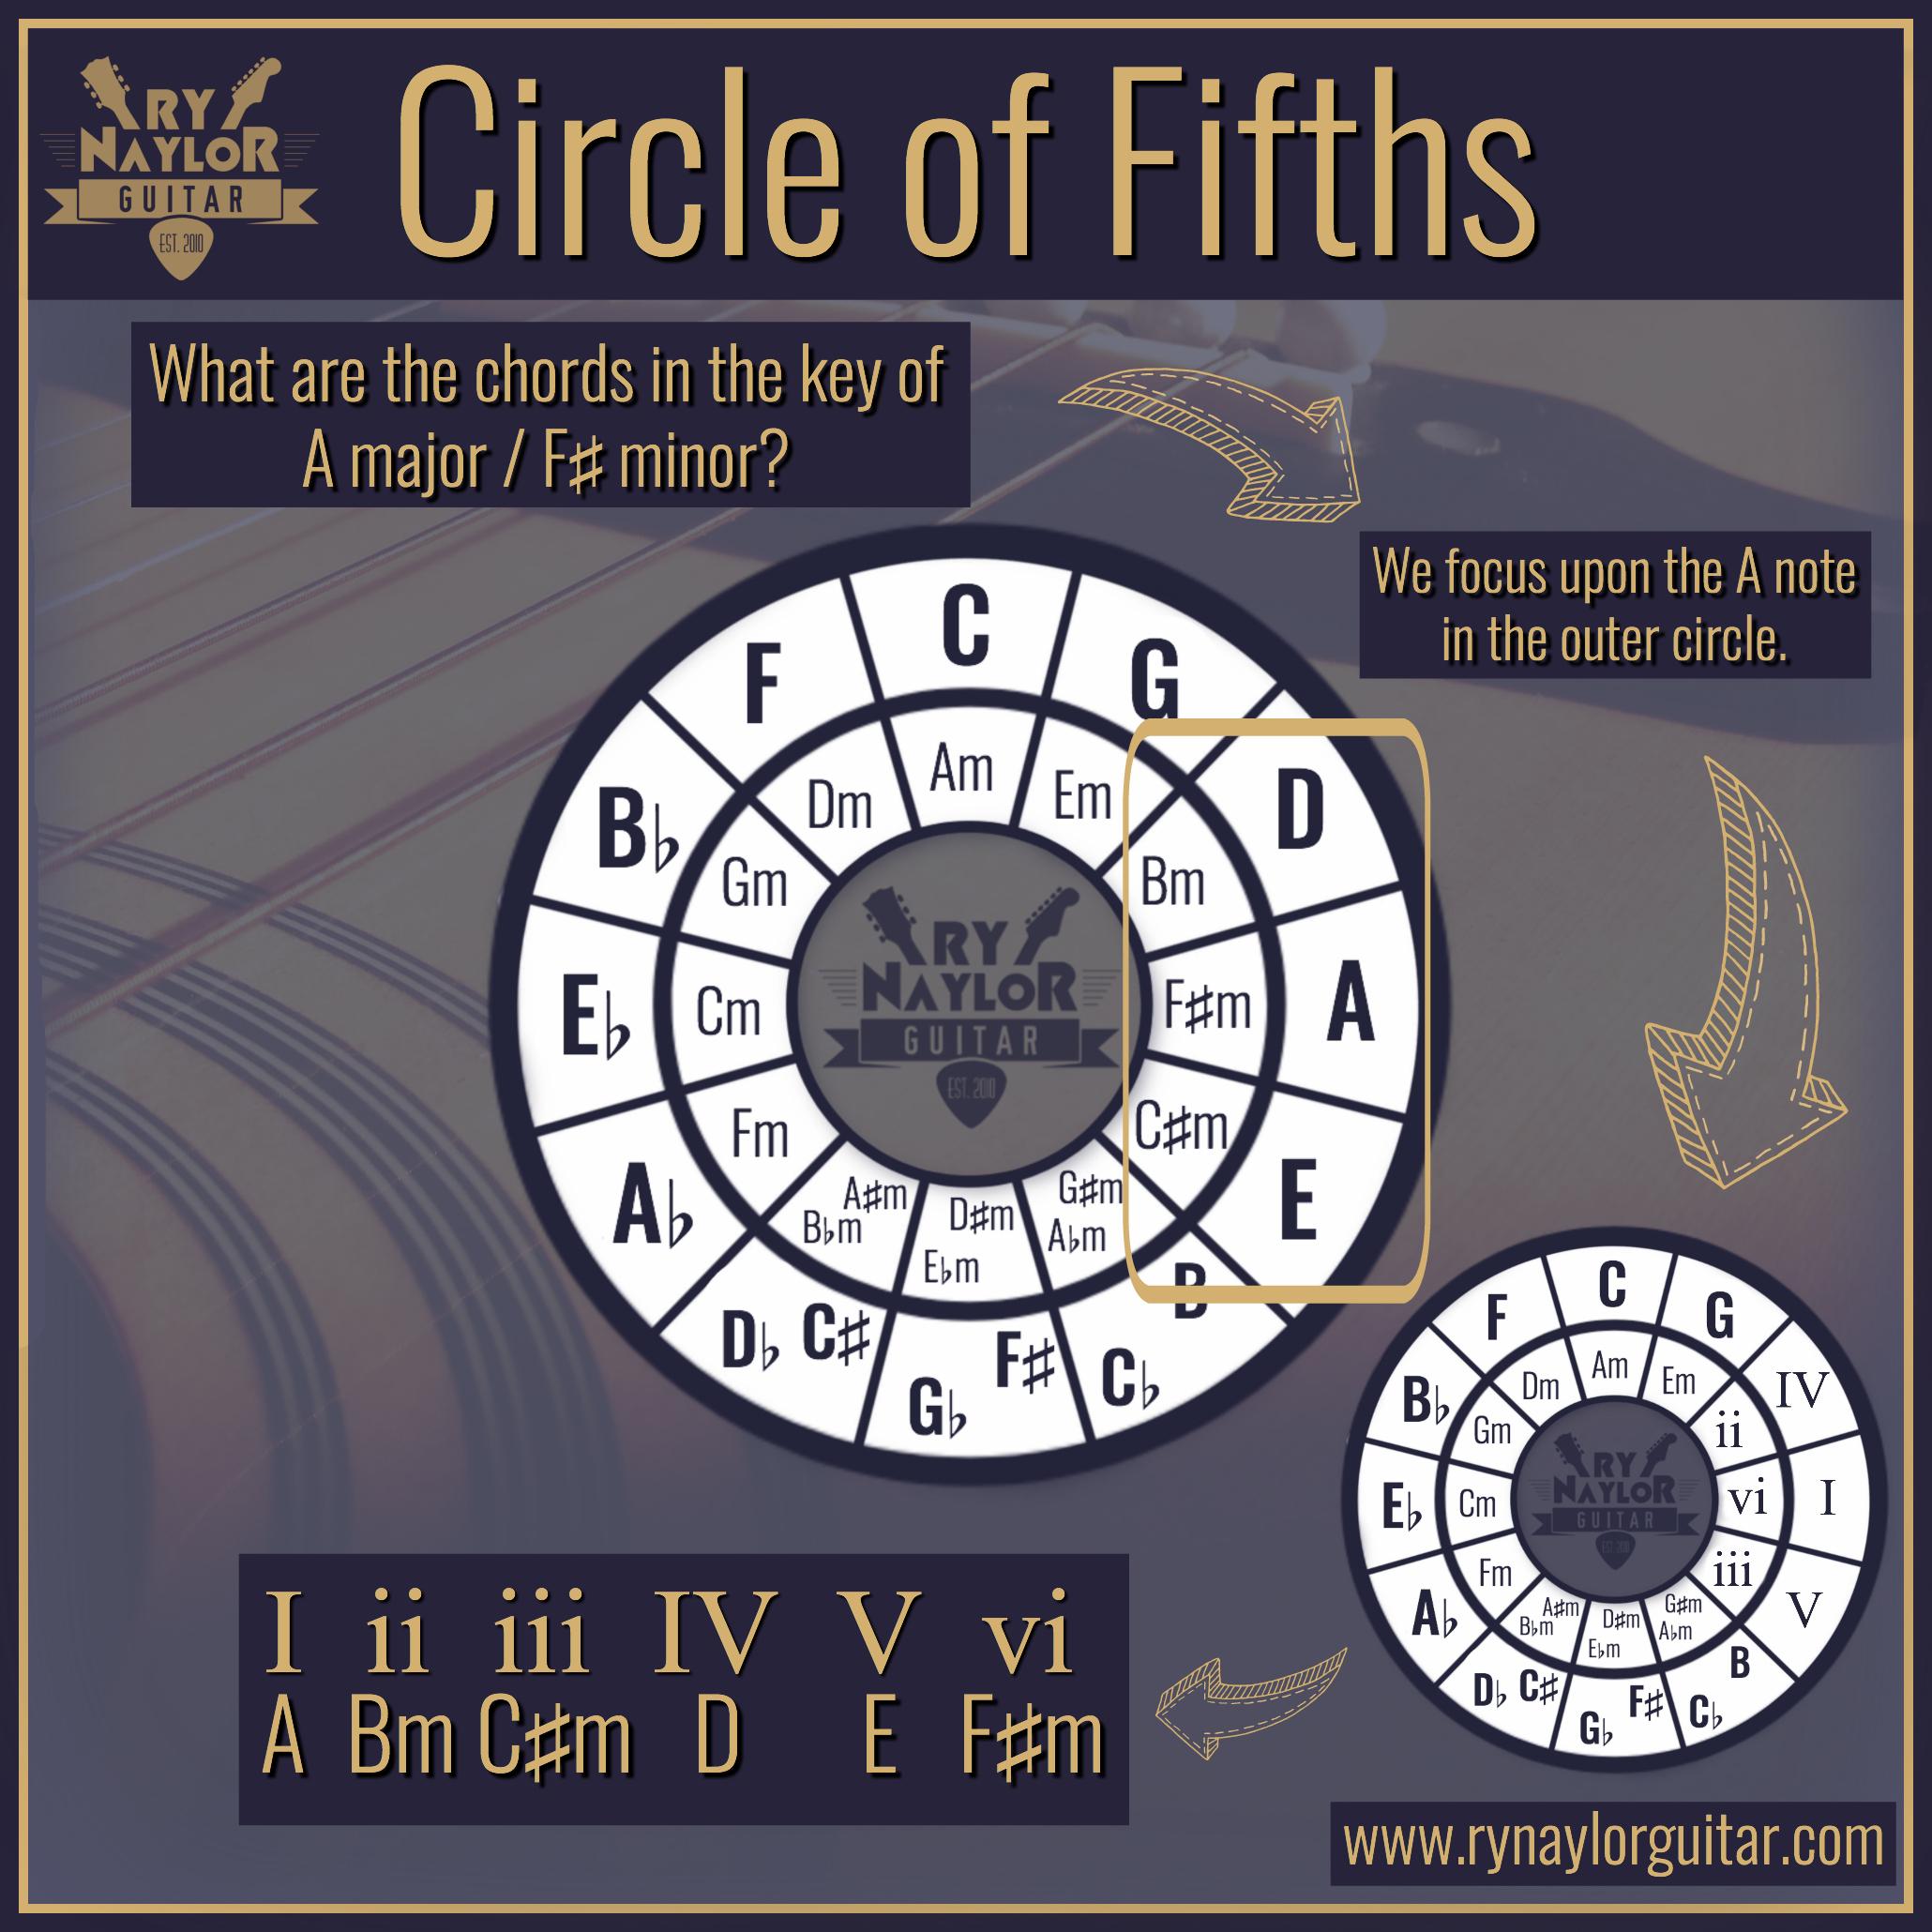 Circle of Fifths 10.jpg